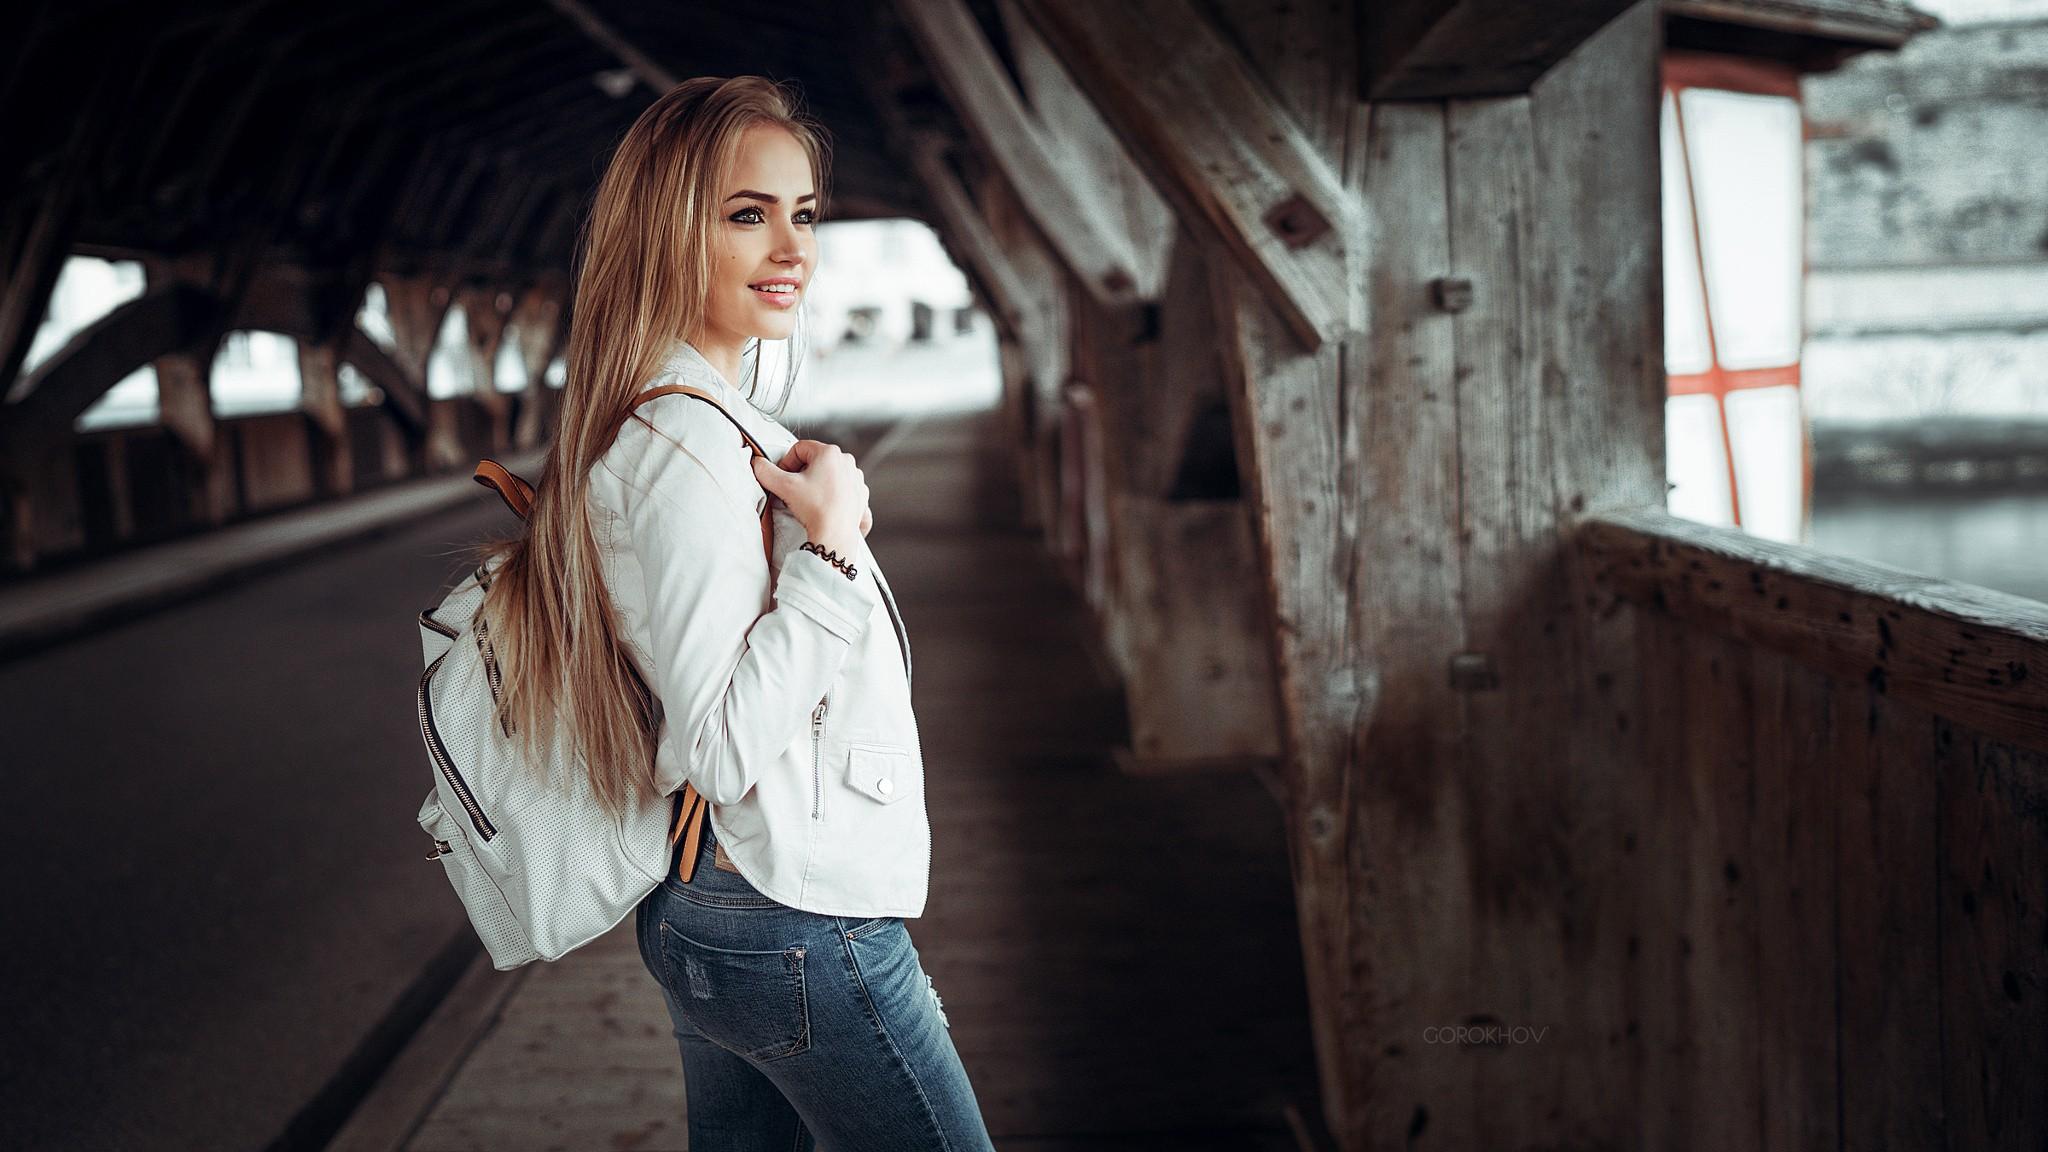 People 2048x1152 urban blonde long hair women model Maria Puchnina white jacket smiling straight hair Mary Jane Ivan Gorokhov Public young woman